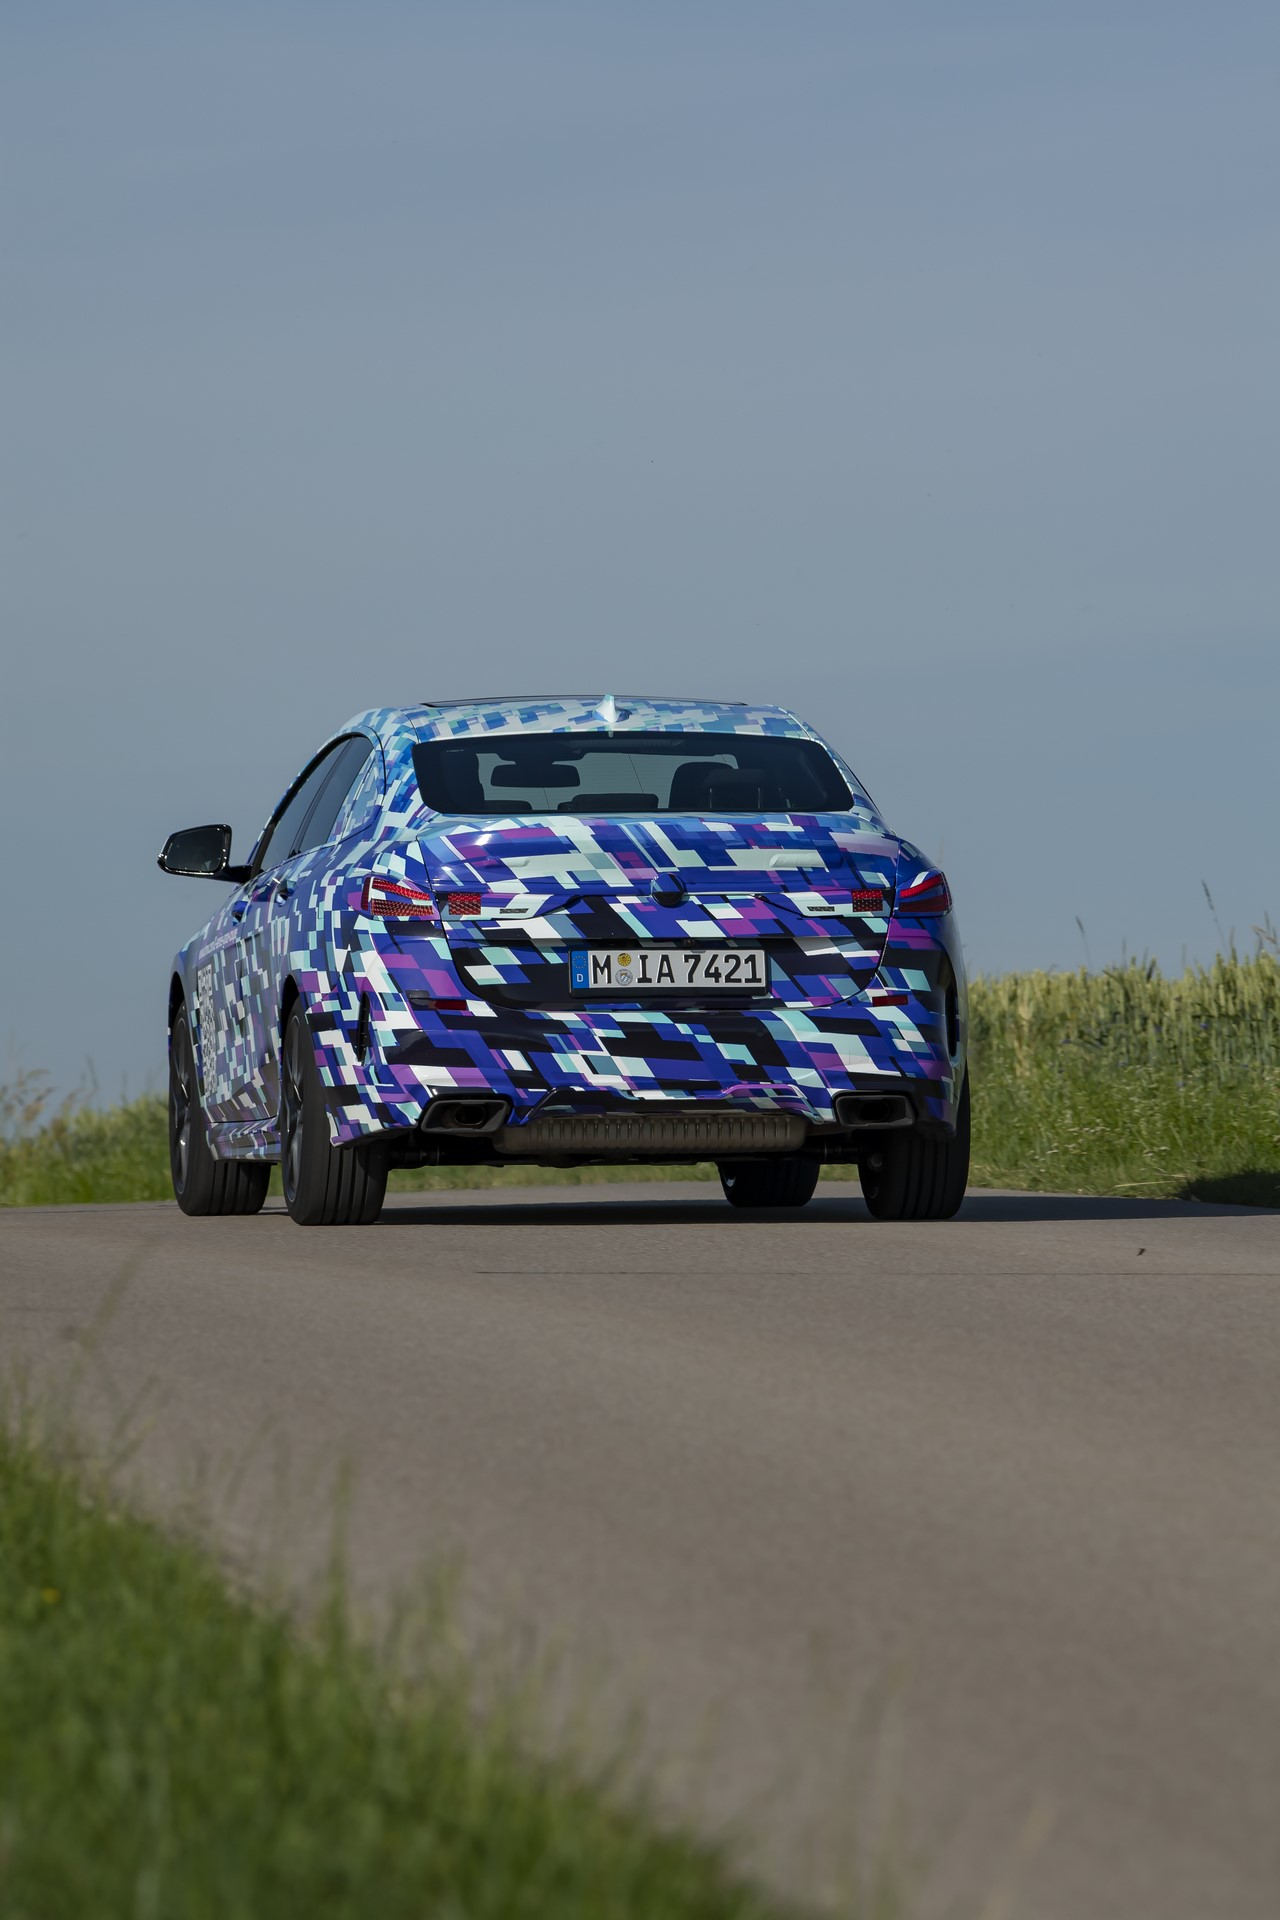 BMW-2-Series-Gran-Coupe-2020-spy-photos-3